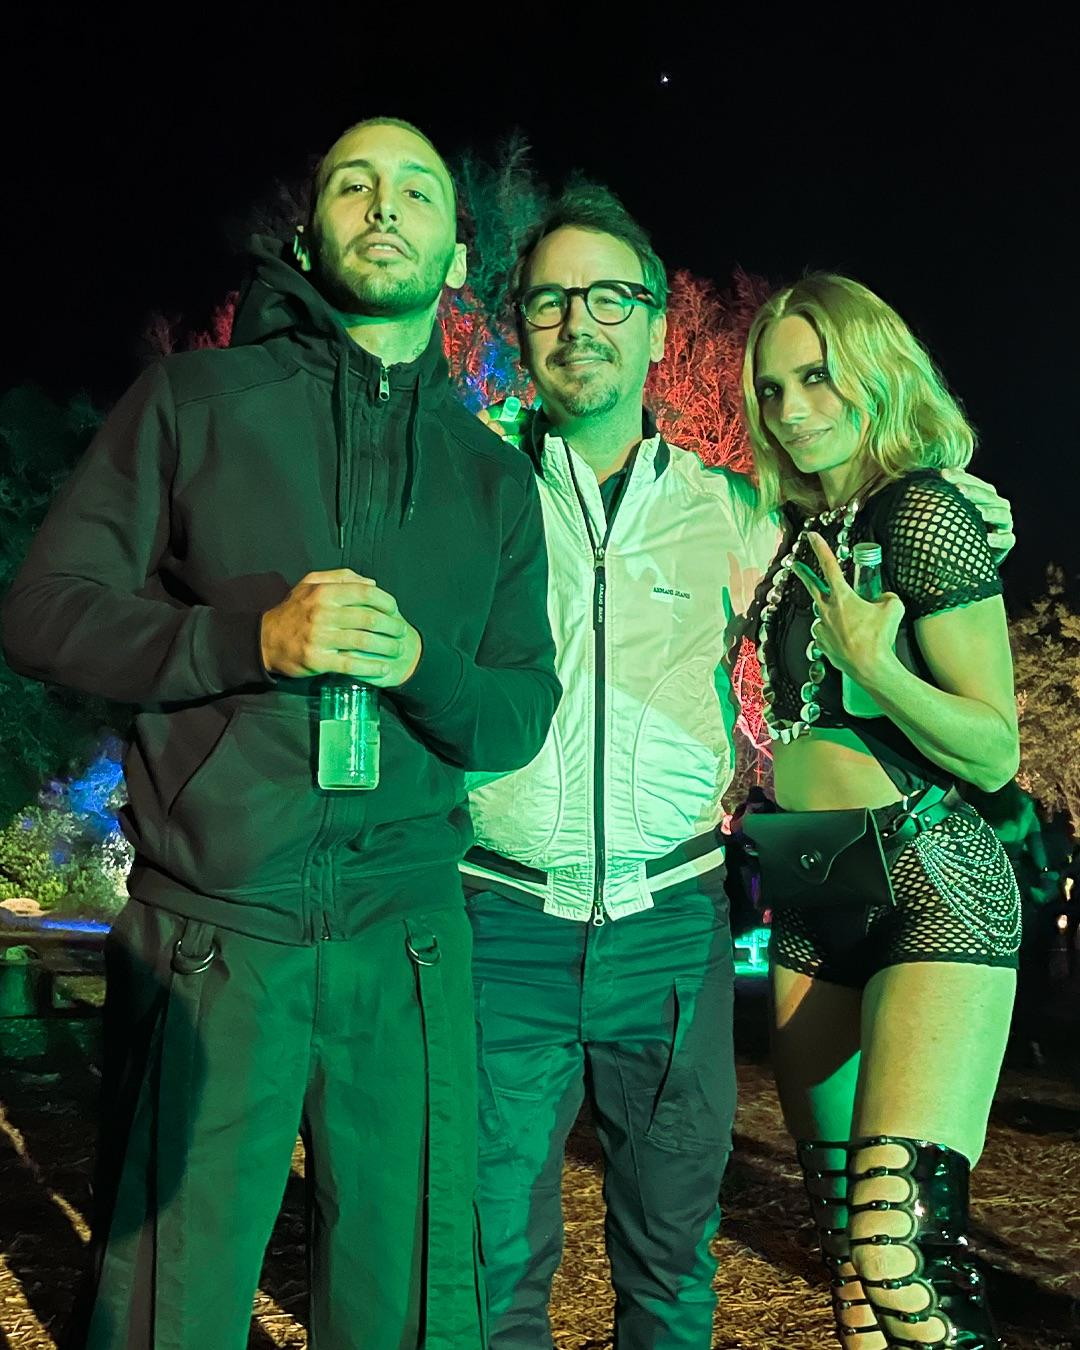 Floriano Pellegrino e Isabella Potì con Paco Morales